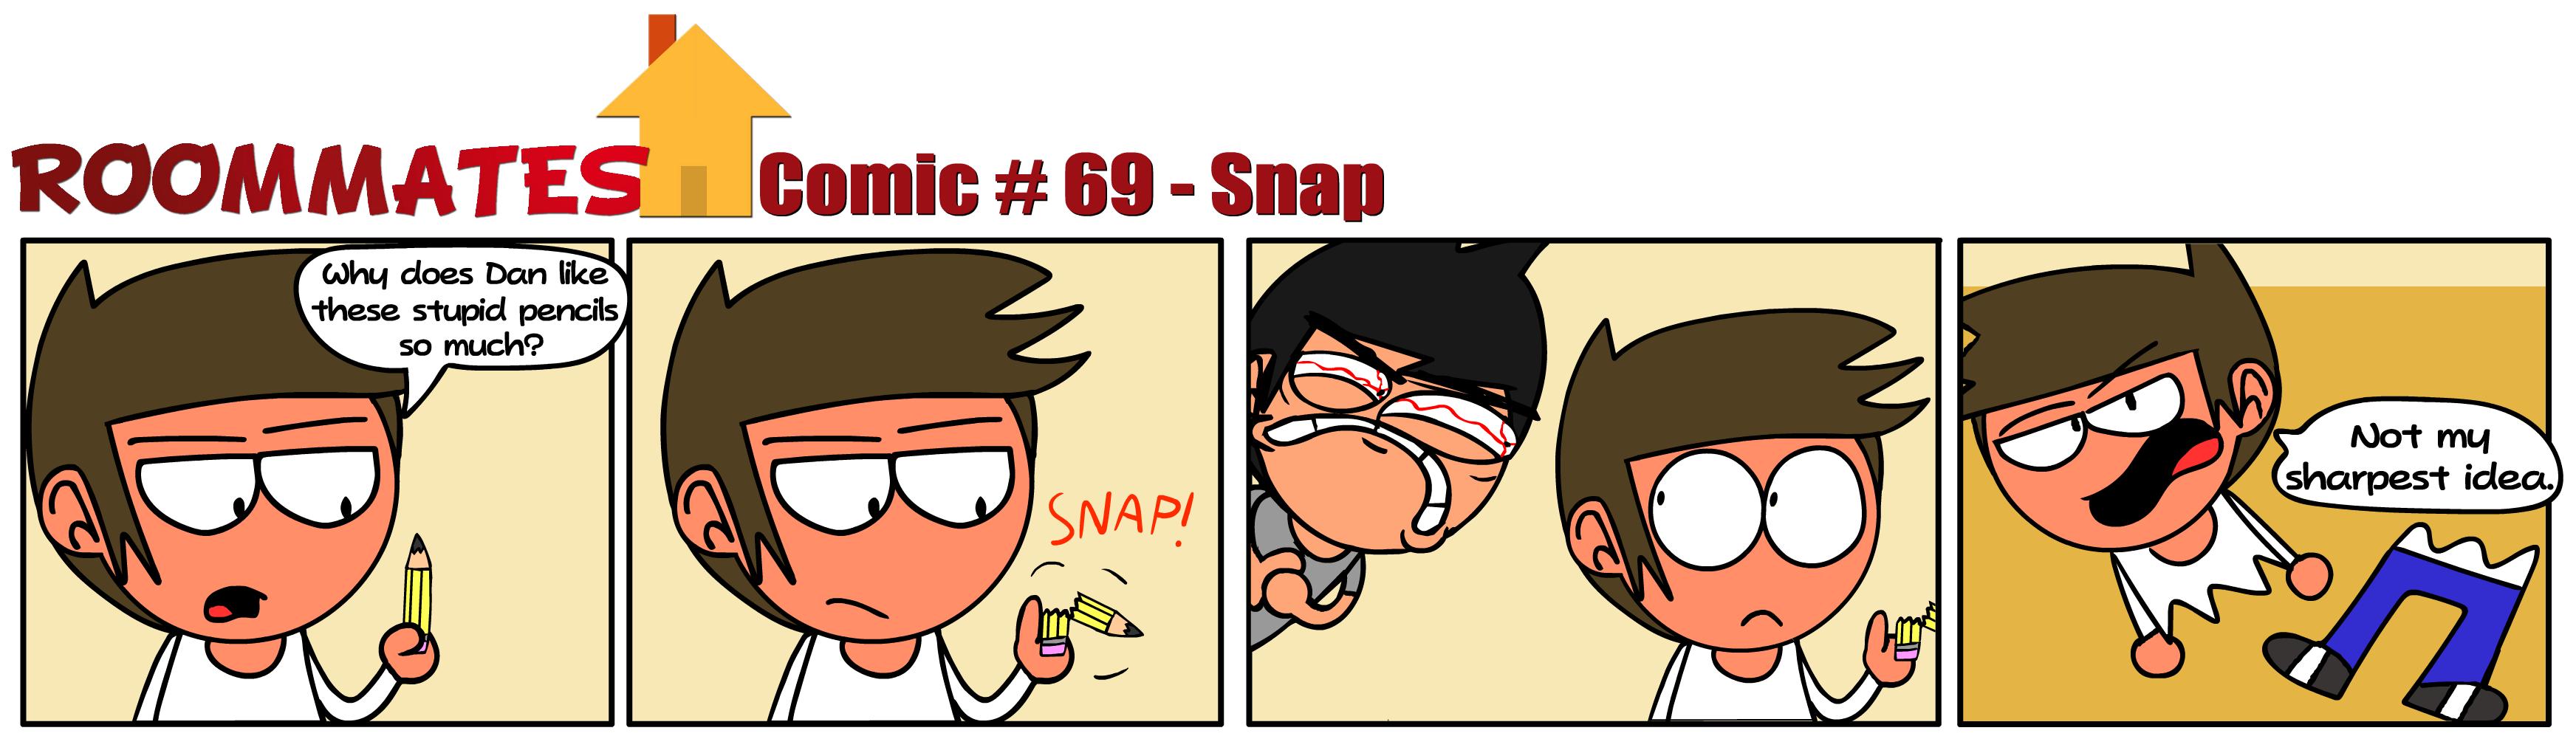 Roommates - Snap (Comic #69)